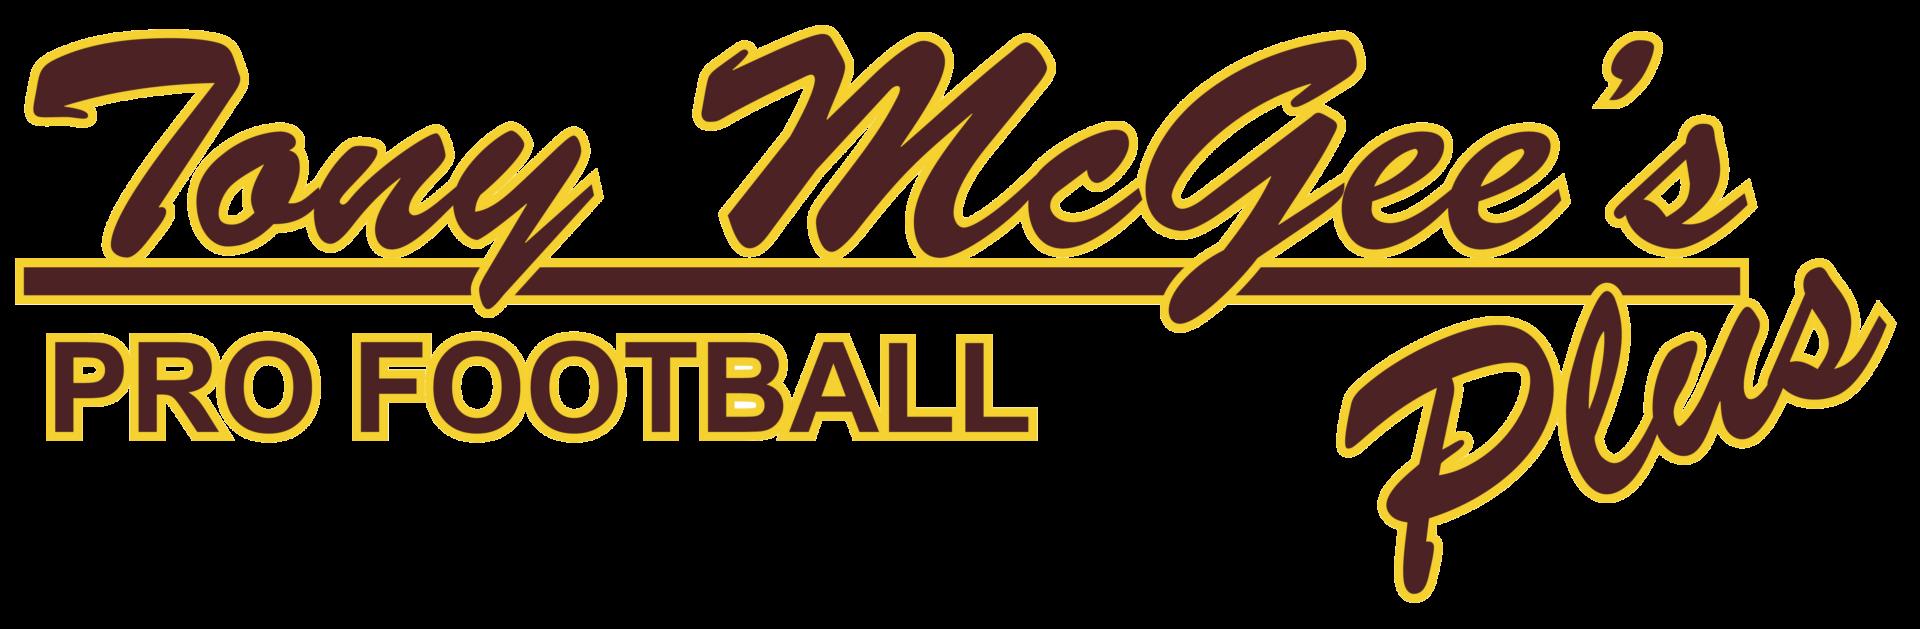 Tony McGee's Pro Football PlusALPHA